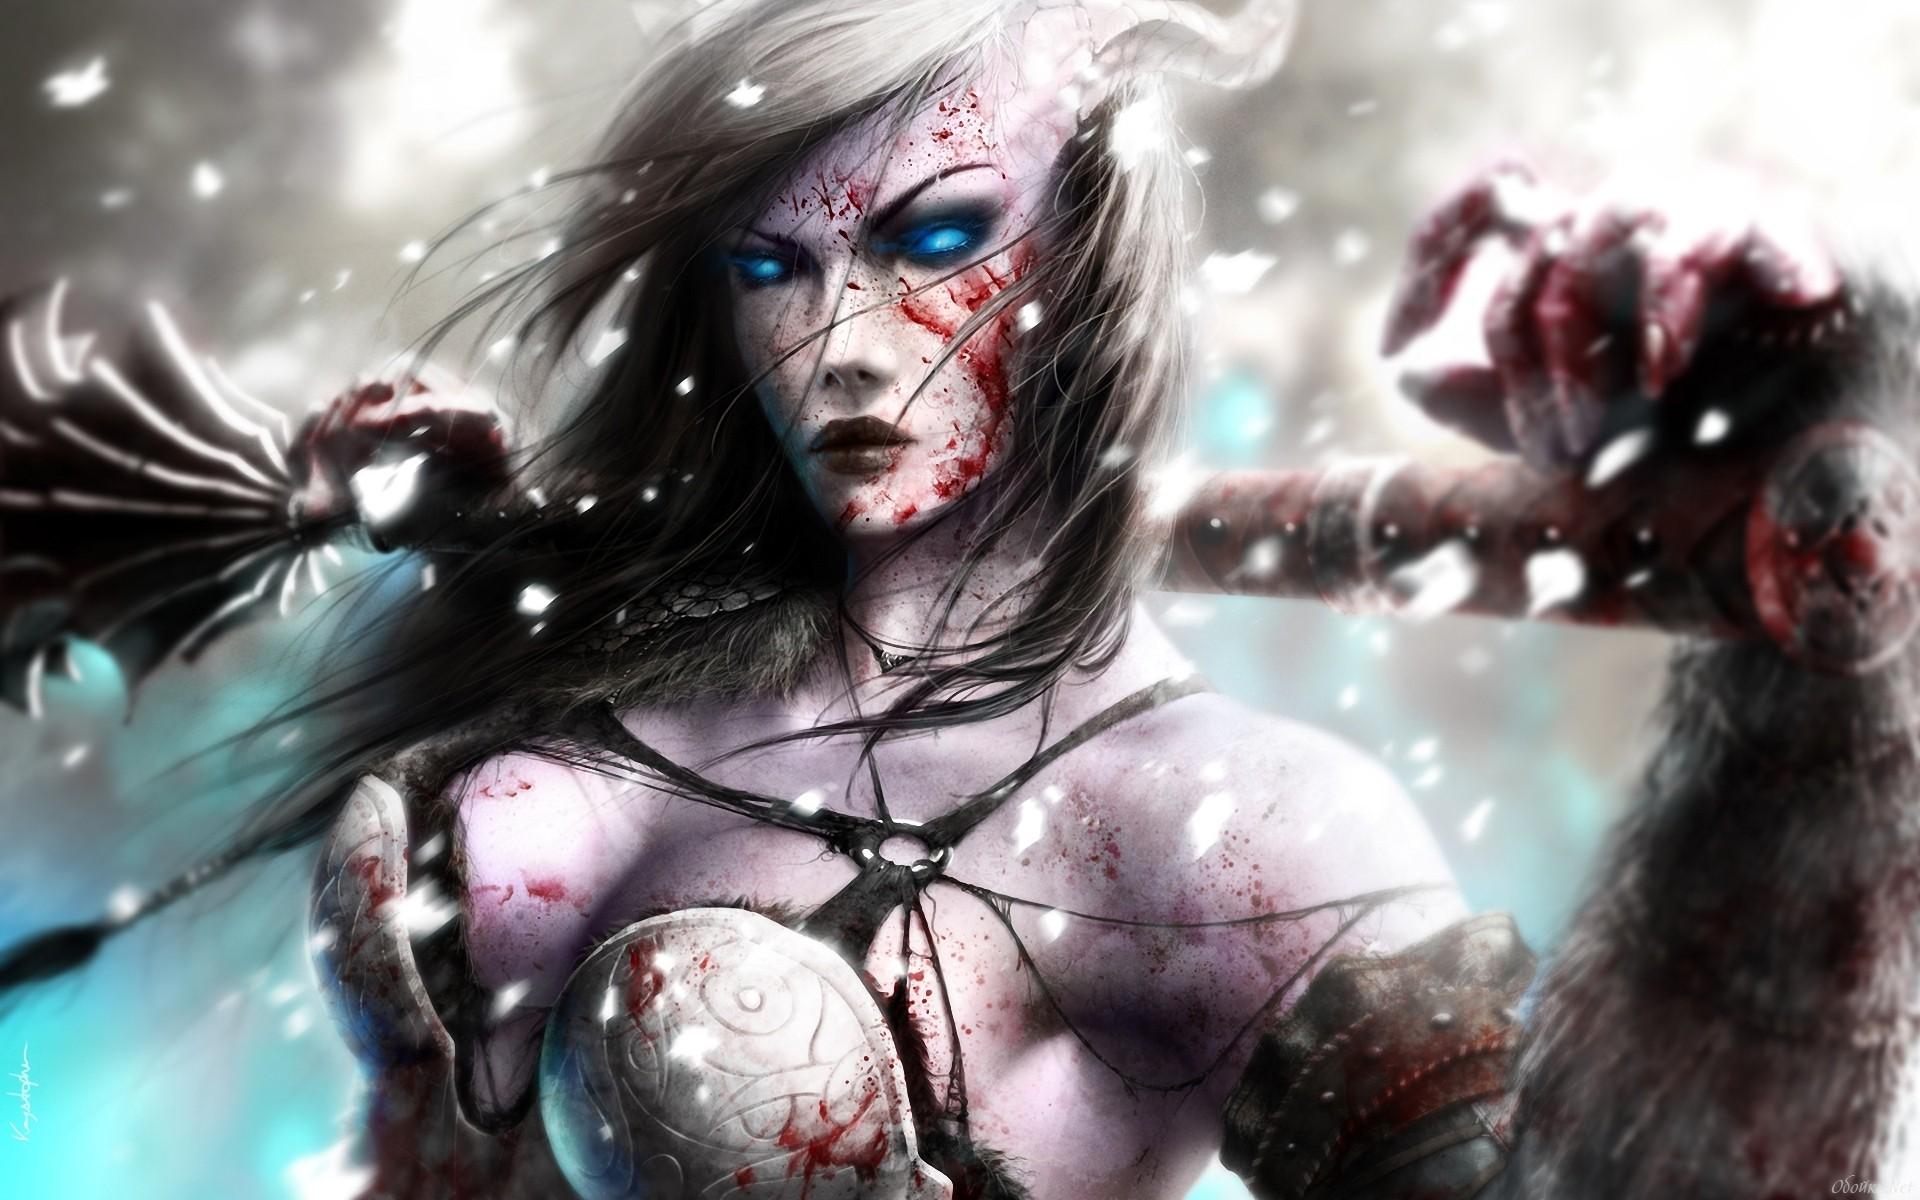 General 1920x1200 women fantasy art artwork draenei World of Warcraft death knights blood glowing eyes blue eyes snow warrior